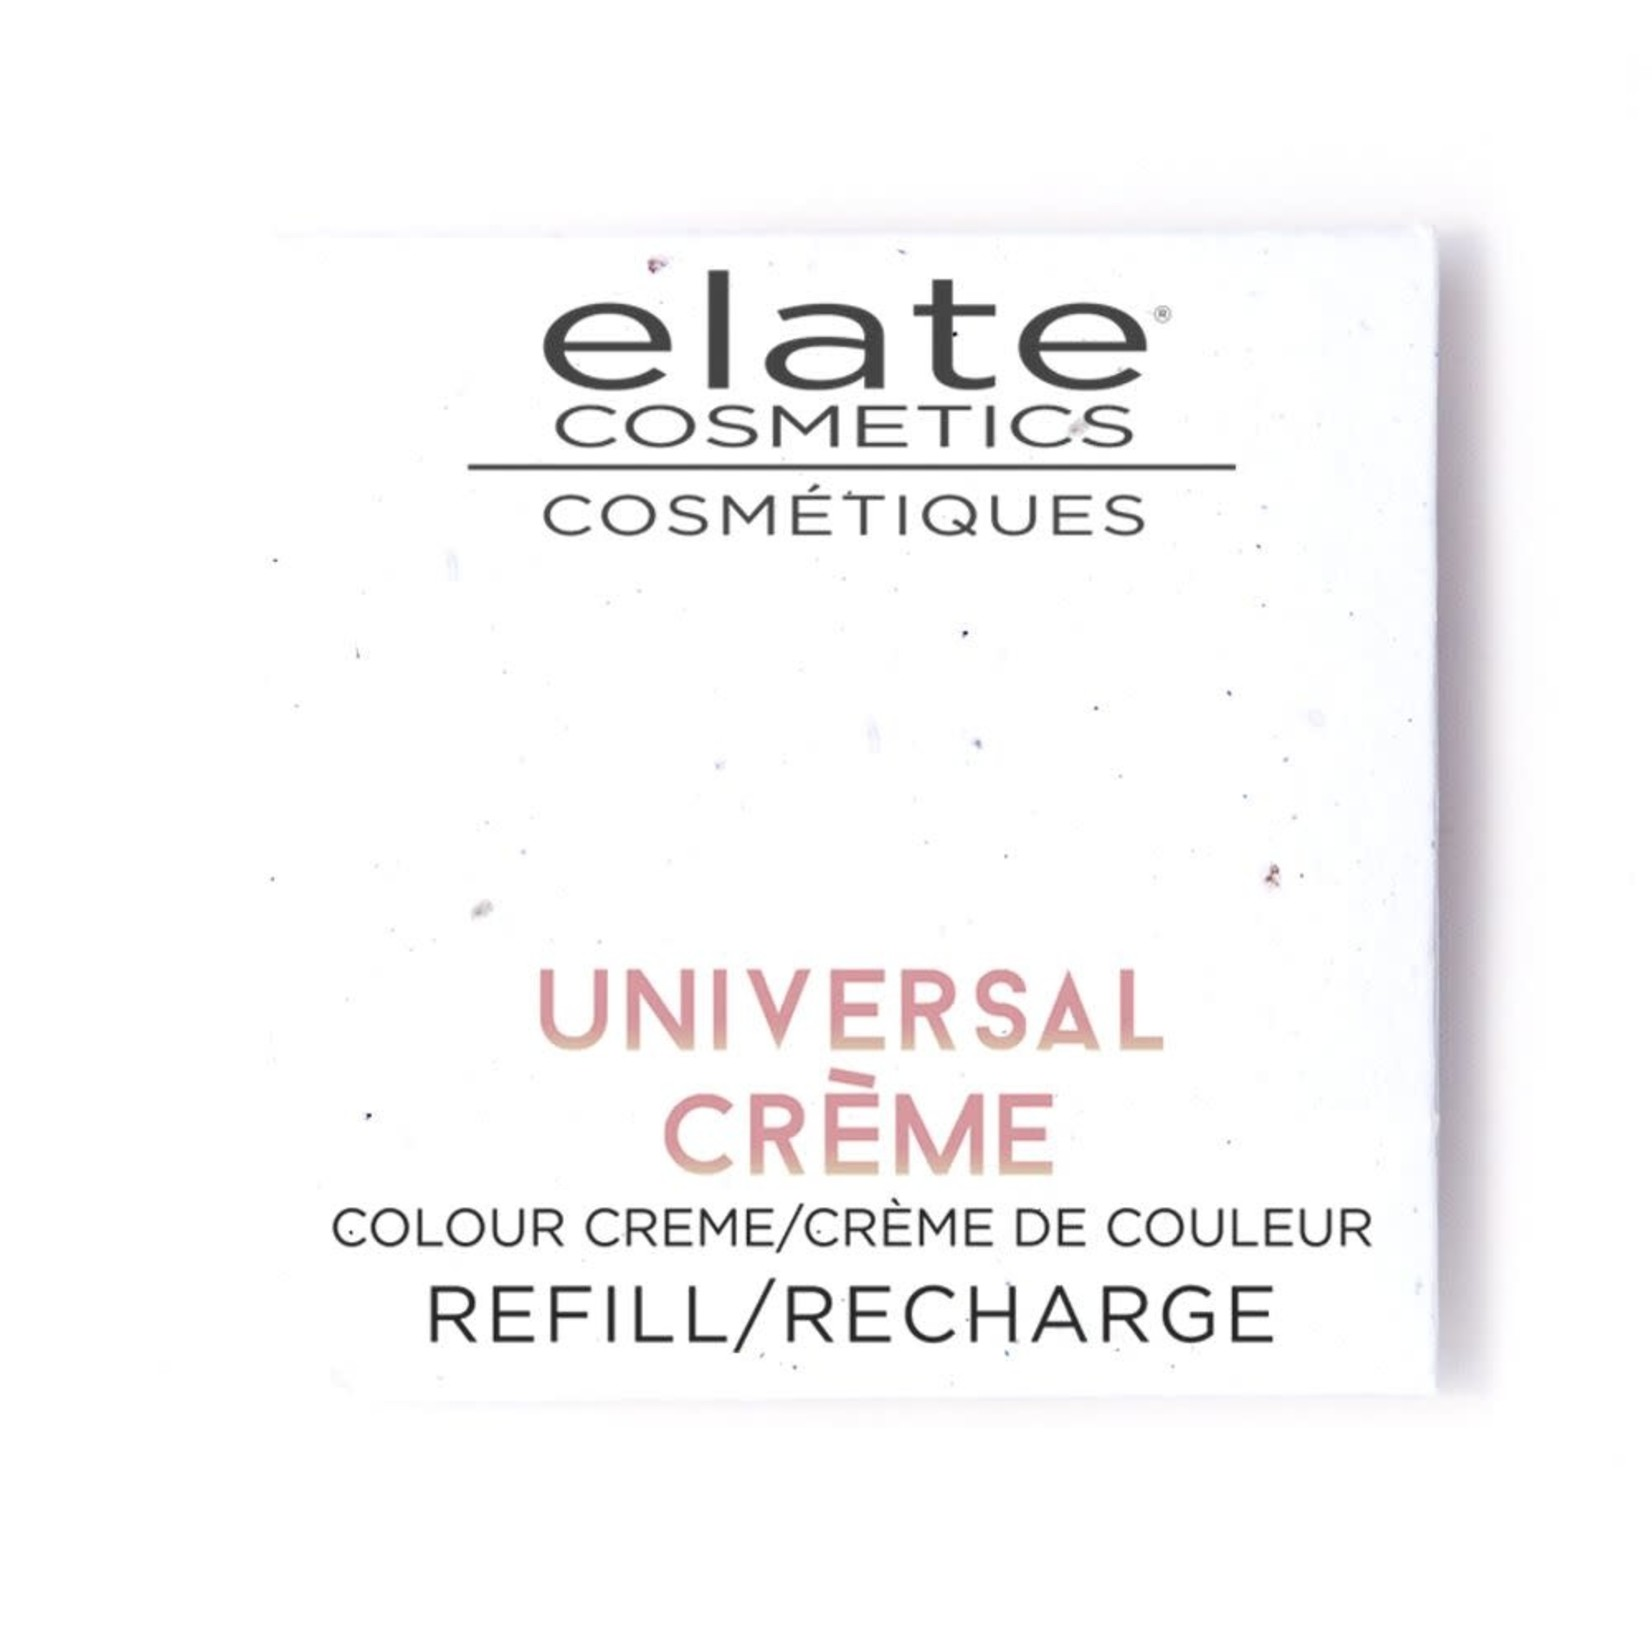 ELATE COSMETICS UNIVERSAL CREME - KEEN